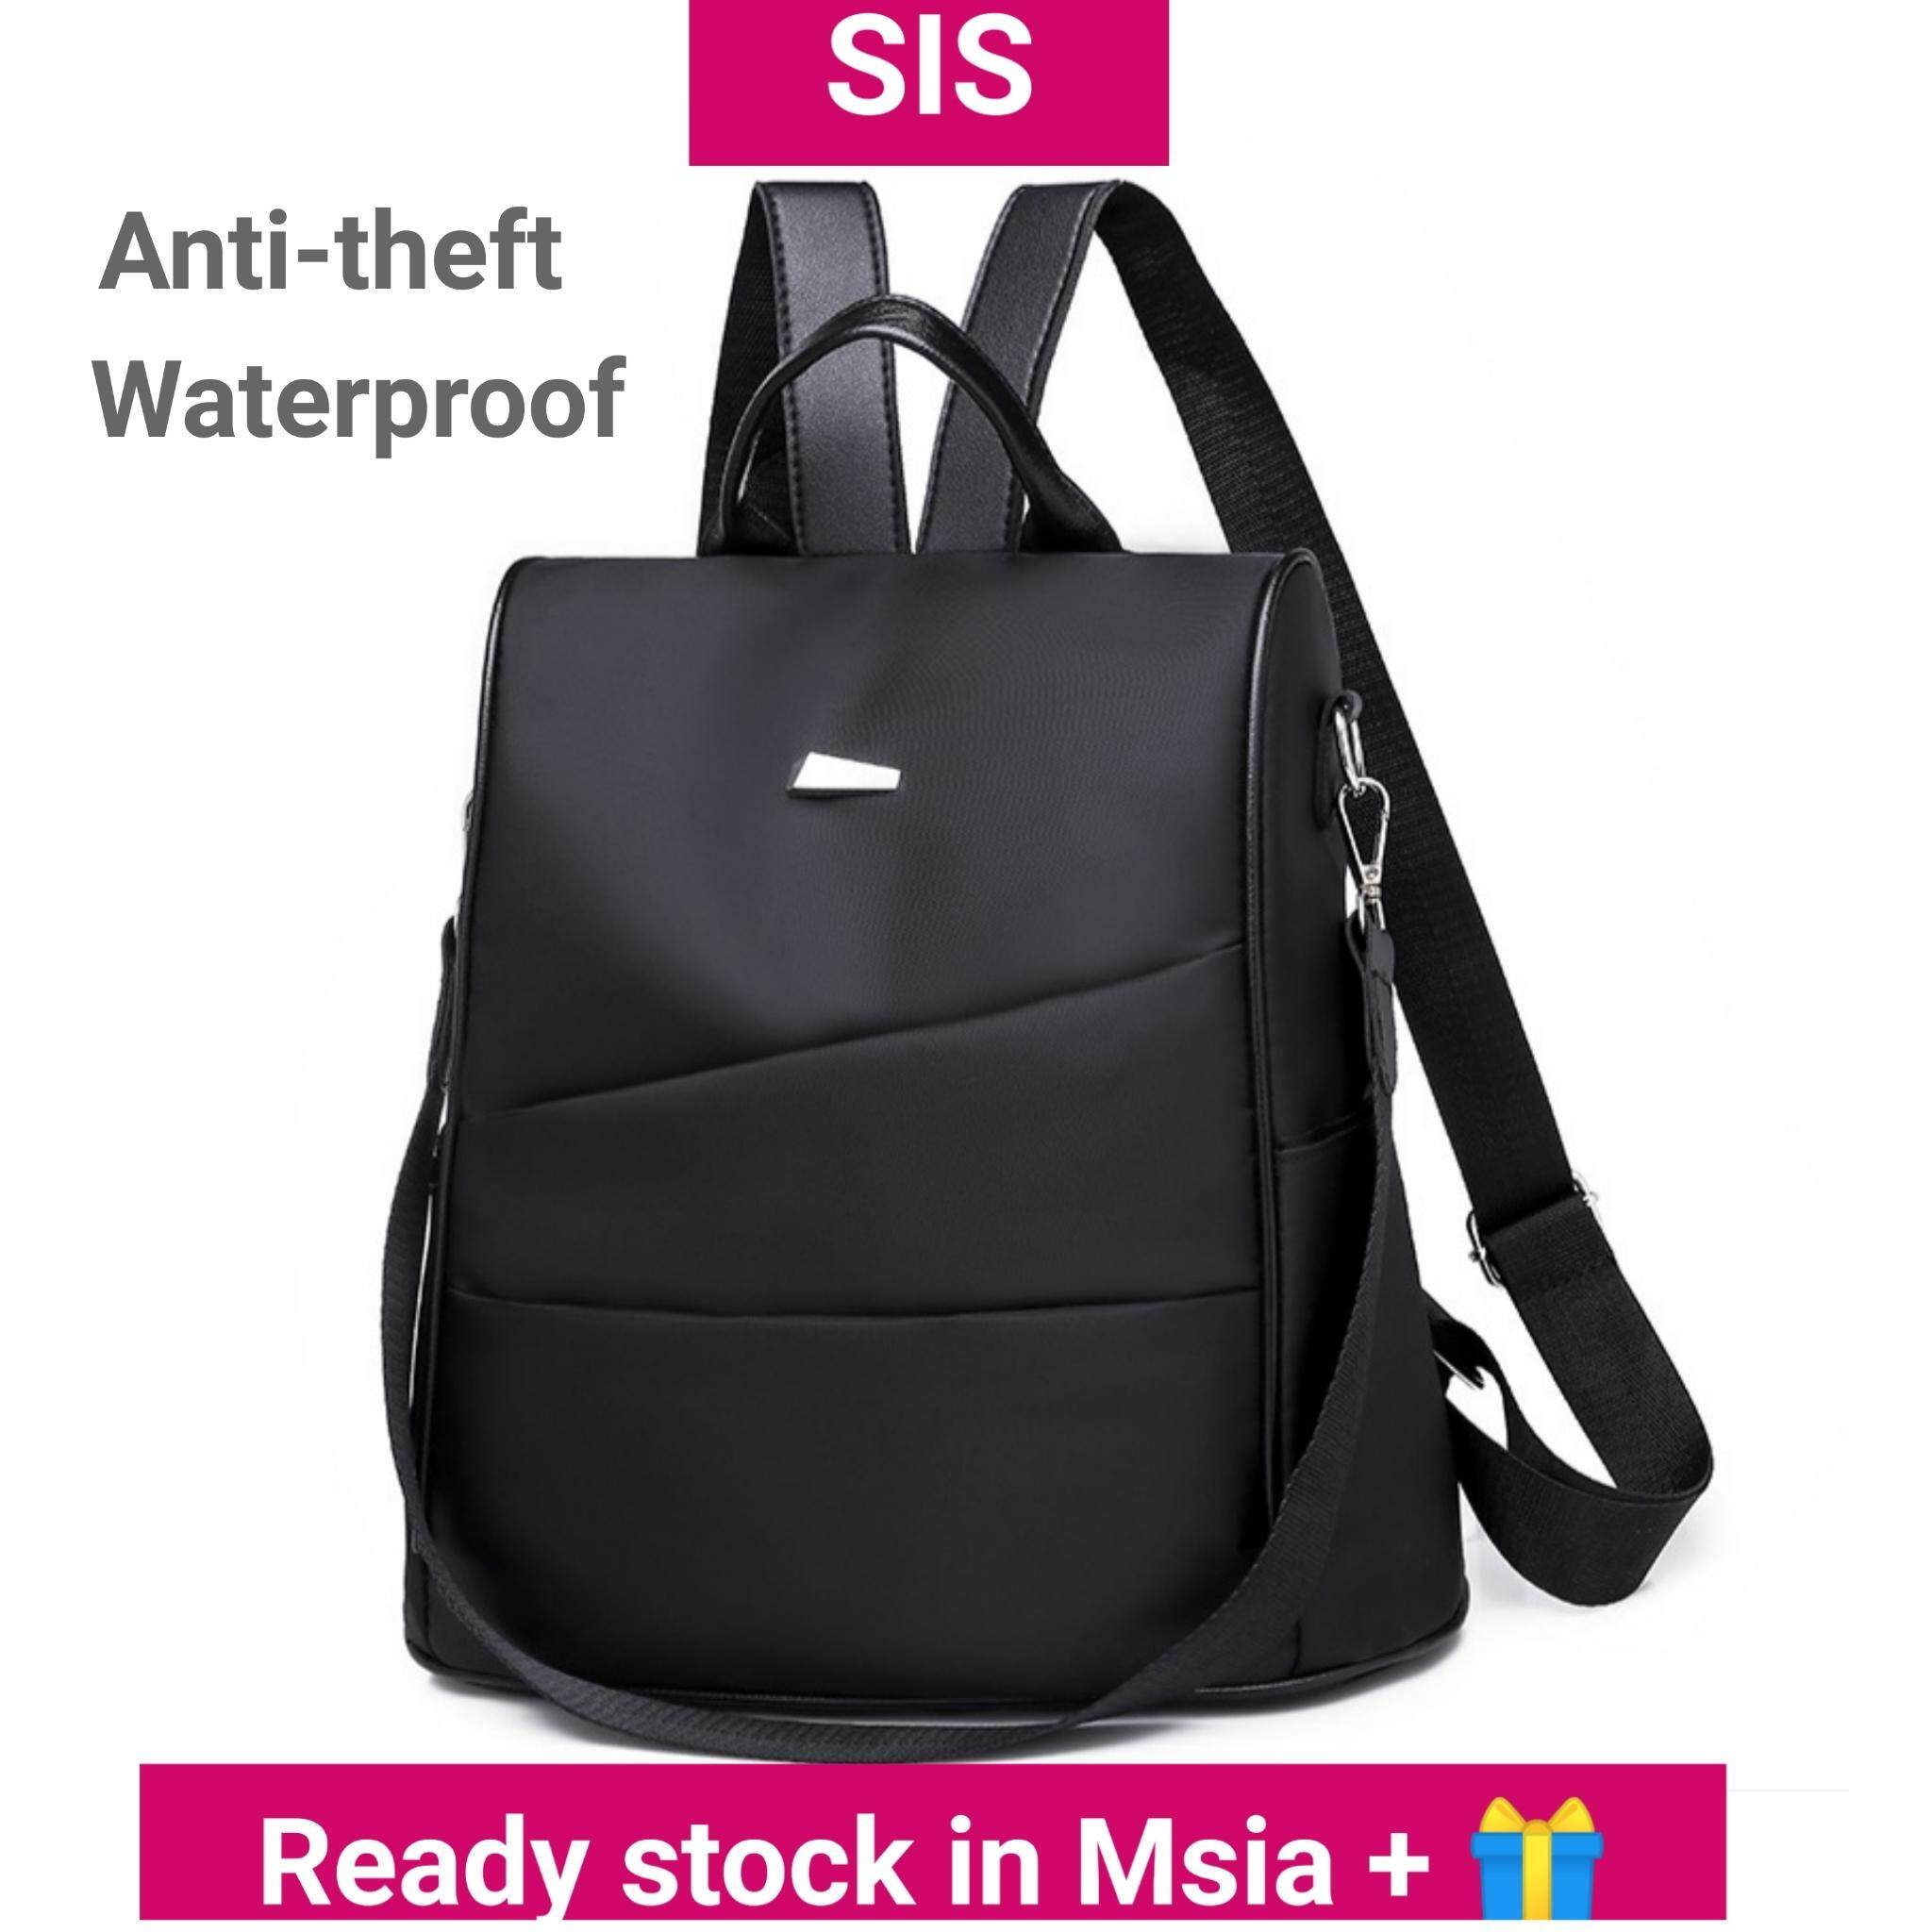 577d8d562f1 Anti-theft and Waterproof Korean Style Ladies Women Backpack Casual  Racksack Travel Bag Sling Bag